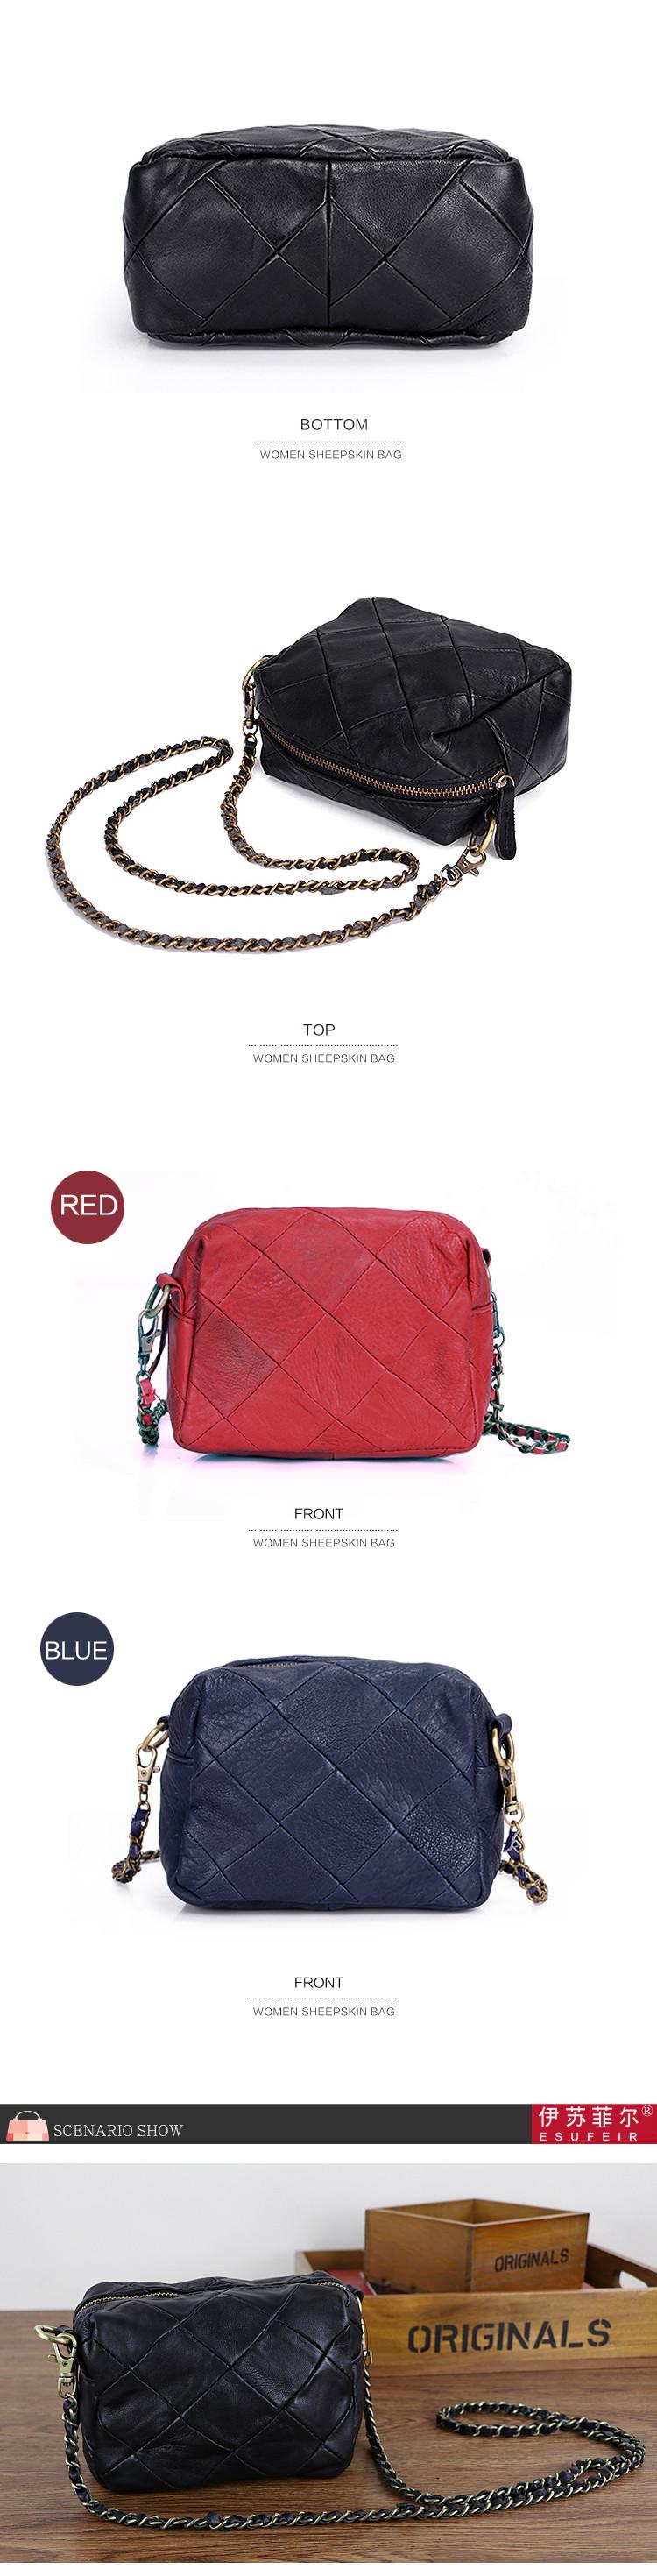 women-handbag02 (2)